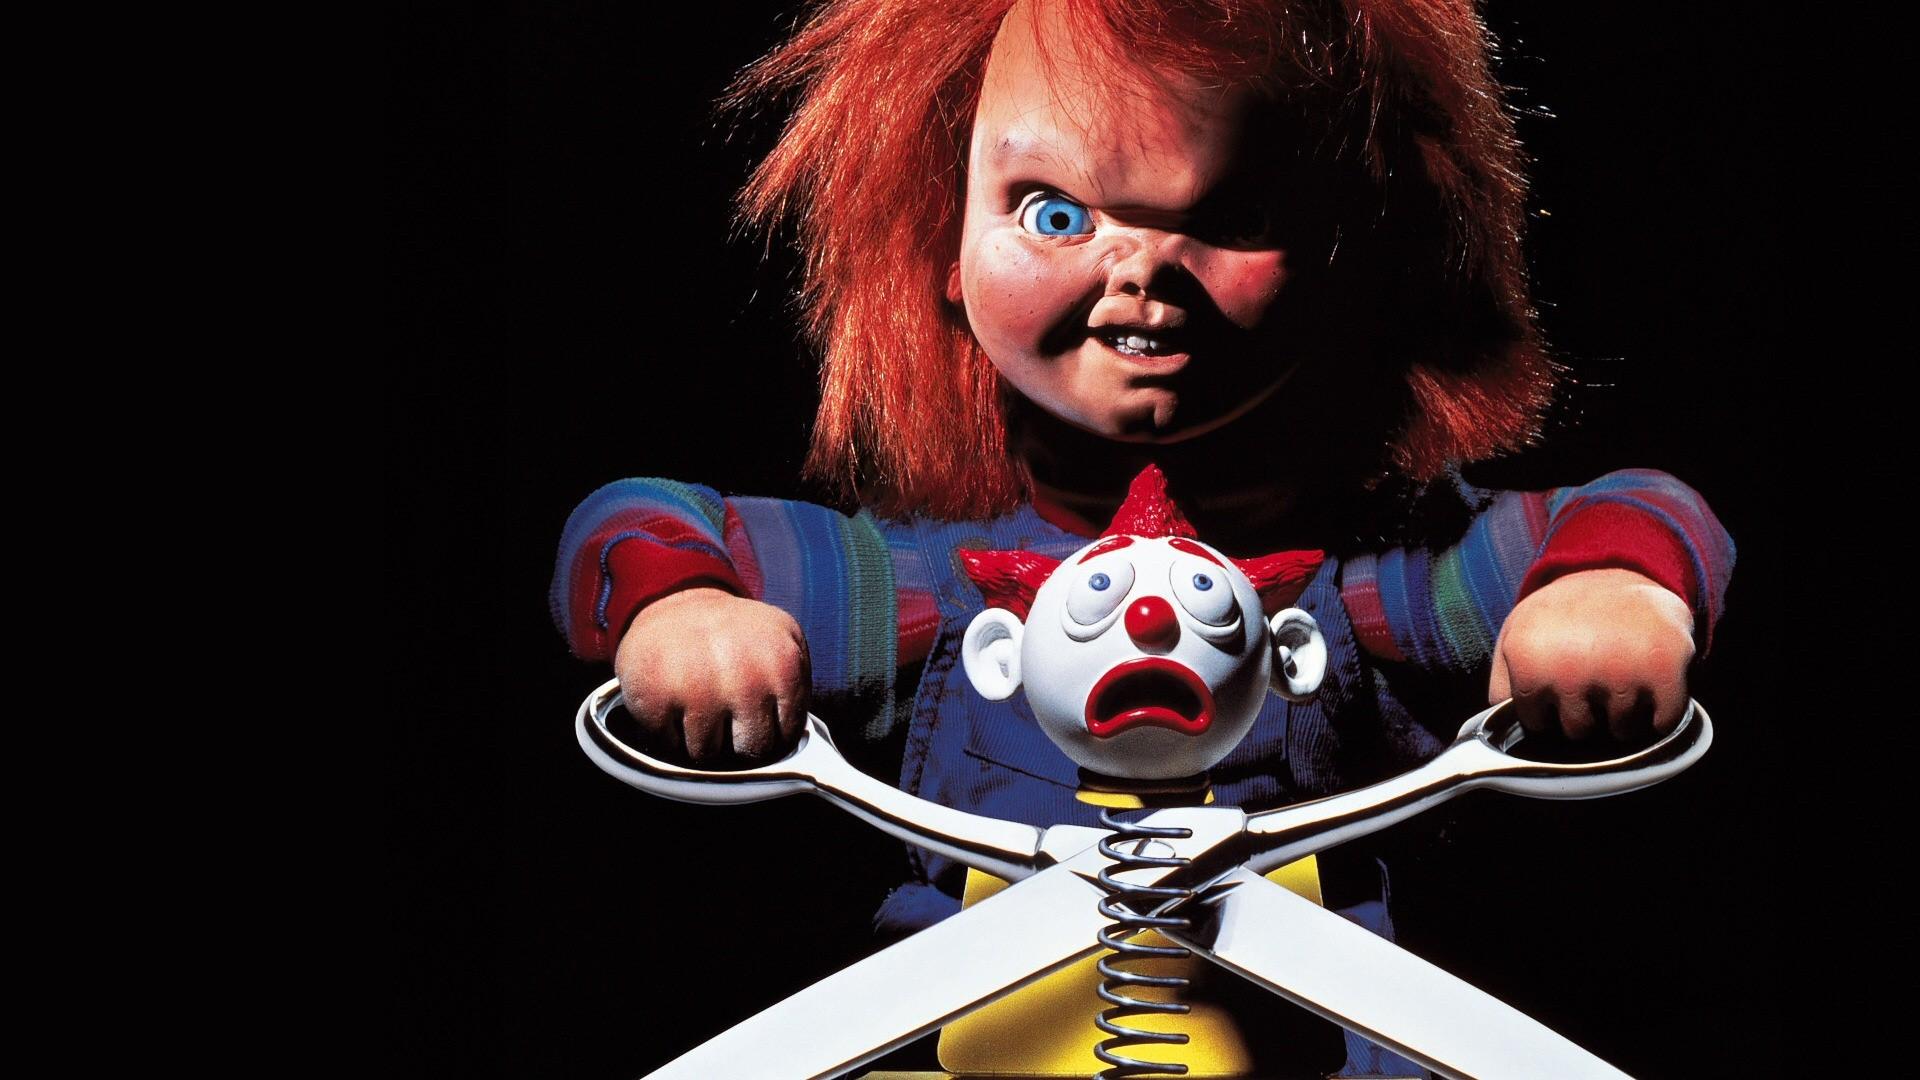 Chucky Doll Black Scissors Child's Play Horror dark wallpaper |  | 218906 | WallpaperUP